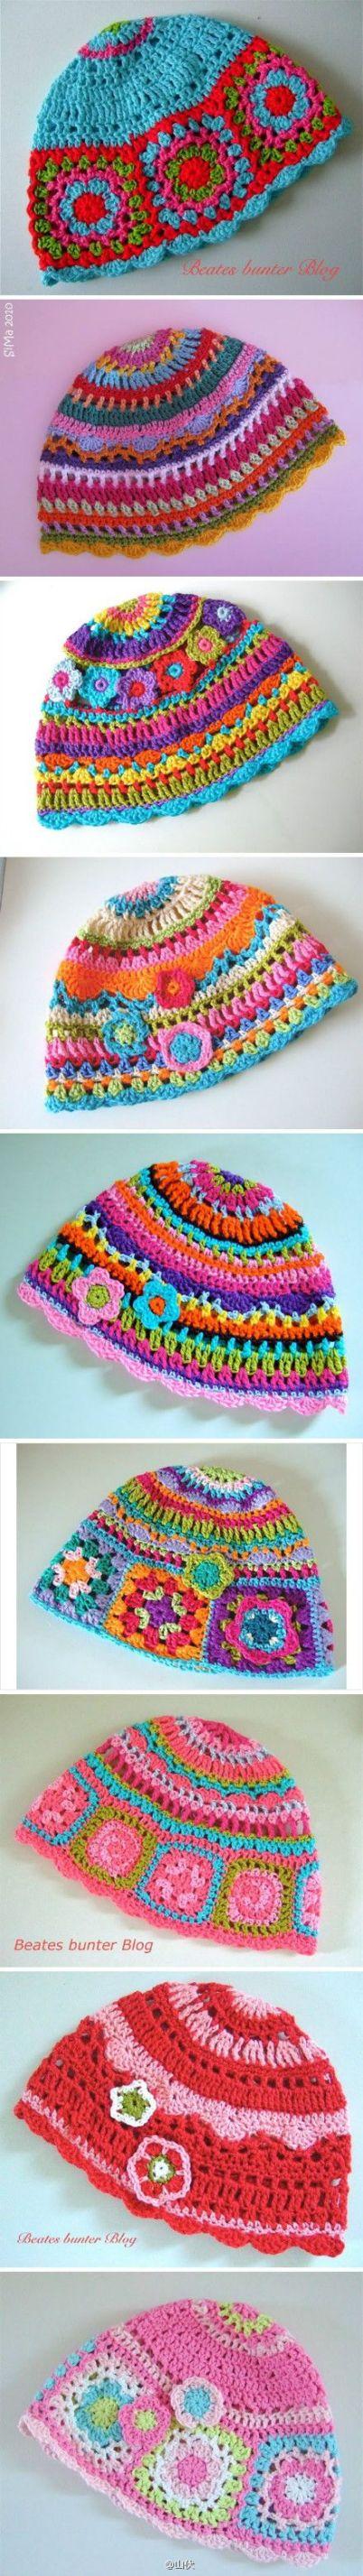 modelos de chapéus de crochê - LINDOS MODELOS DE CHAPÉUS DE CROCHÊS INFANTIS